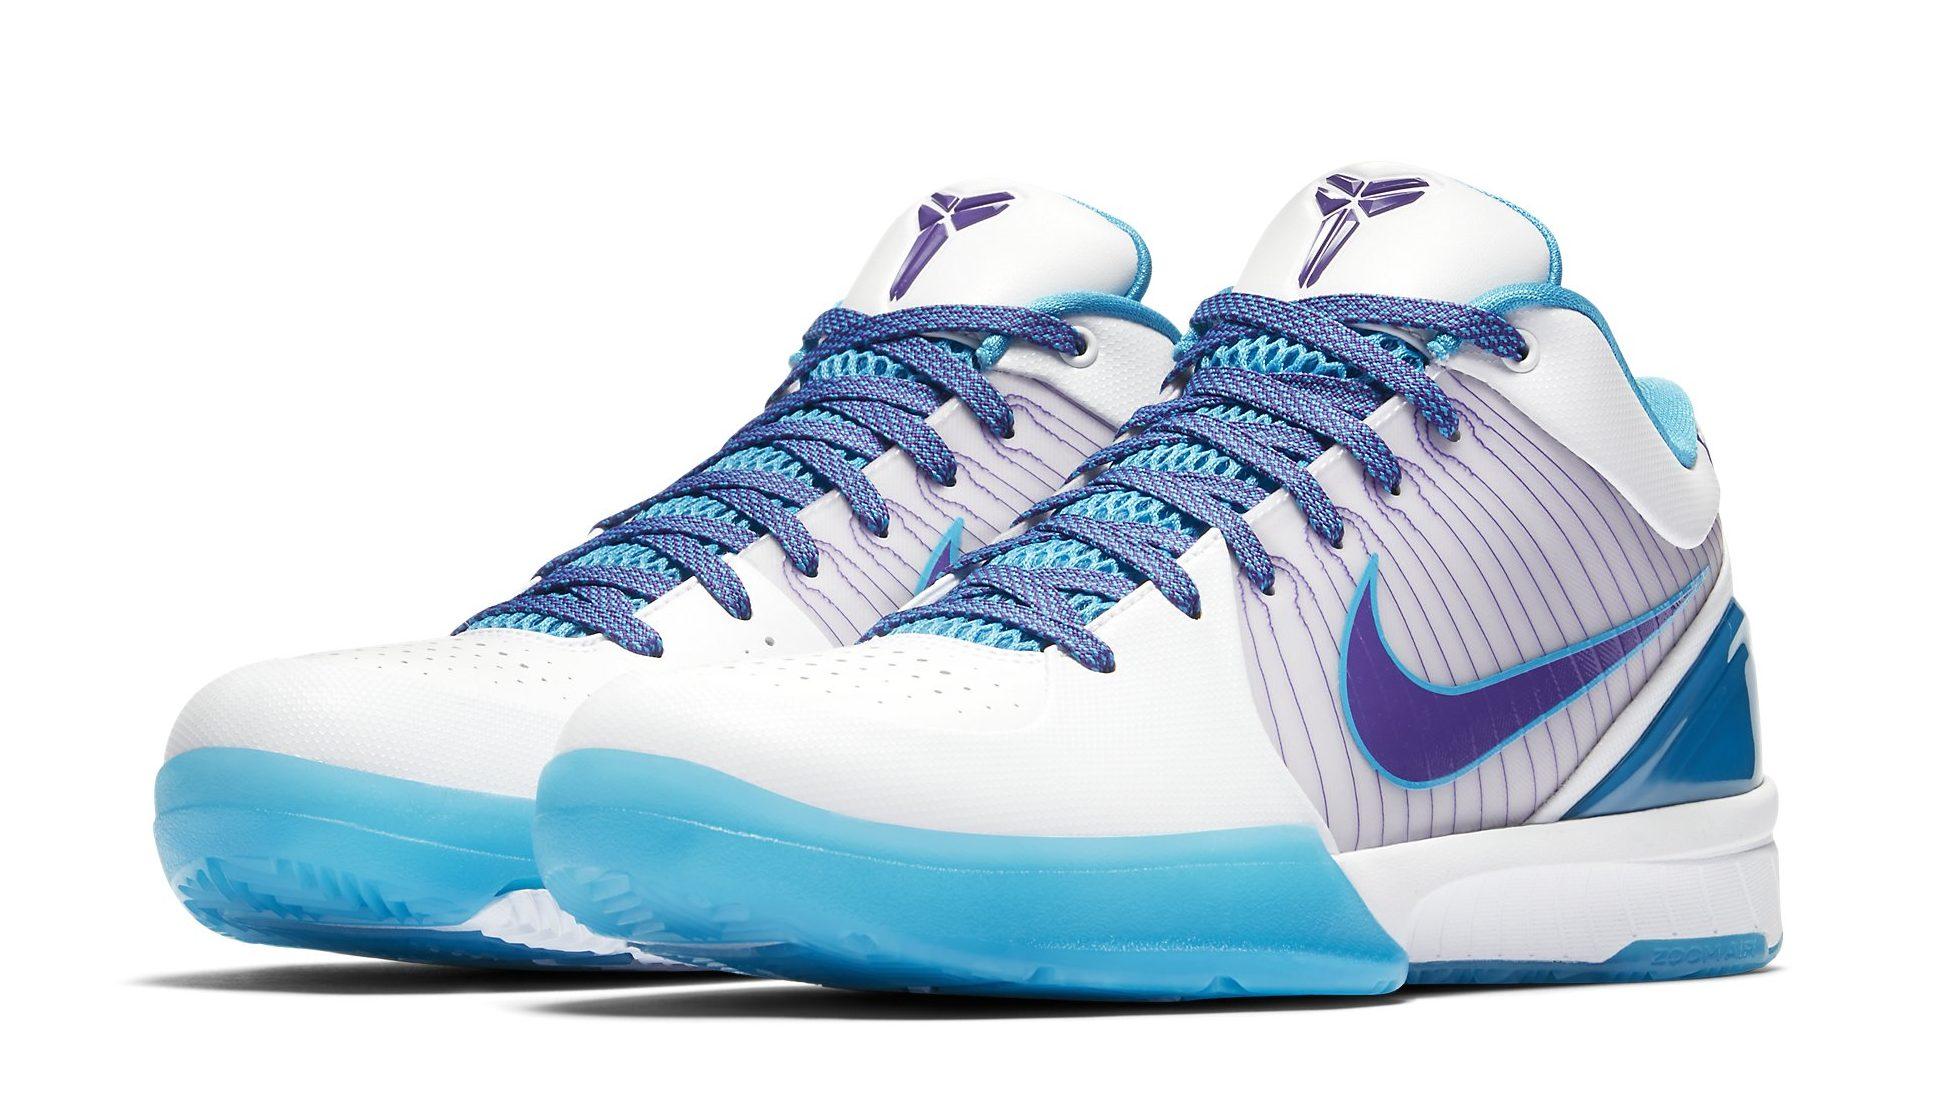 Nike Zoom Kobe 4 Protro 'Draft Day